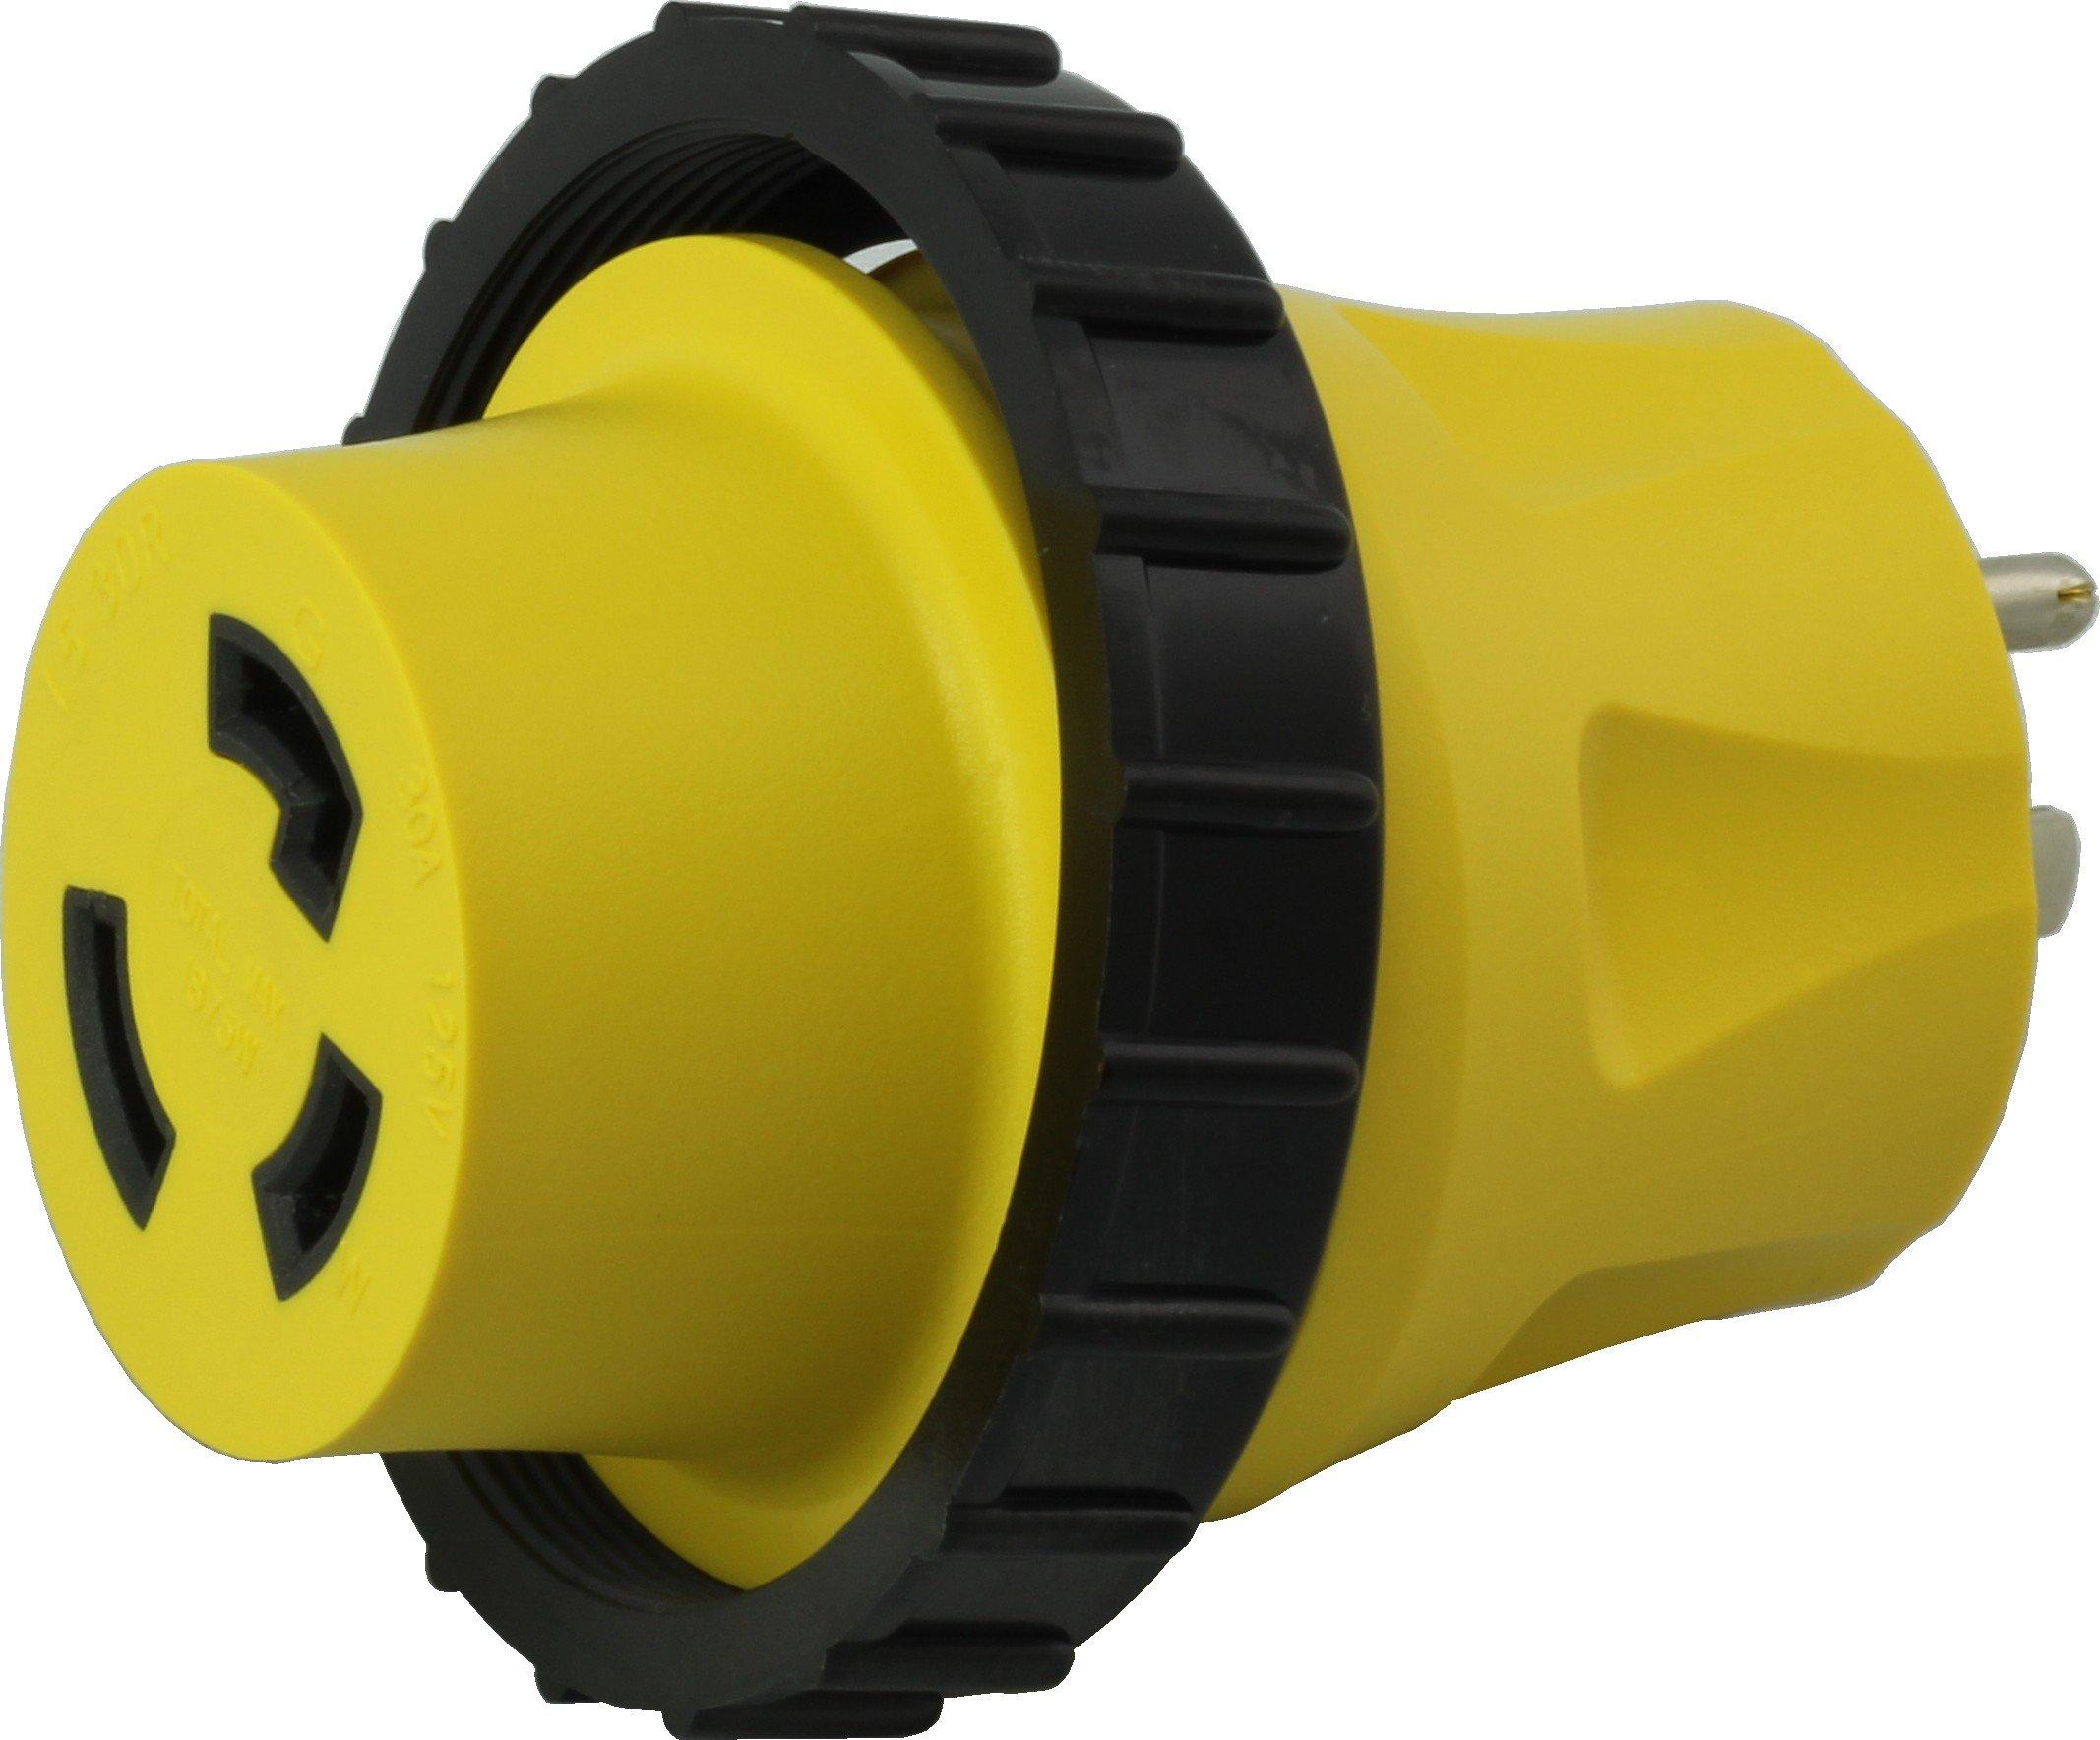 AC WORKS 30Amp RV Marine Detachable Adapters (5-15P Household 15A Plug)